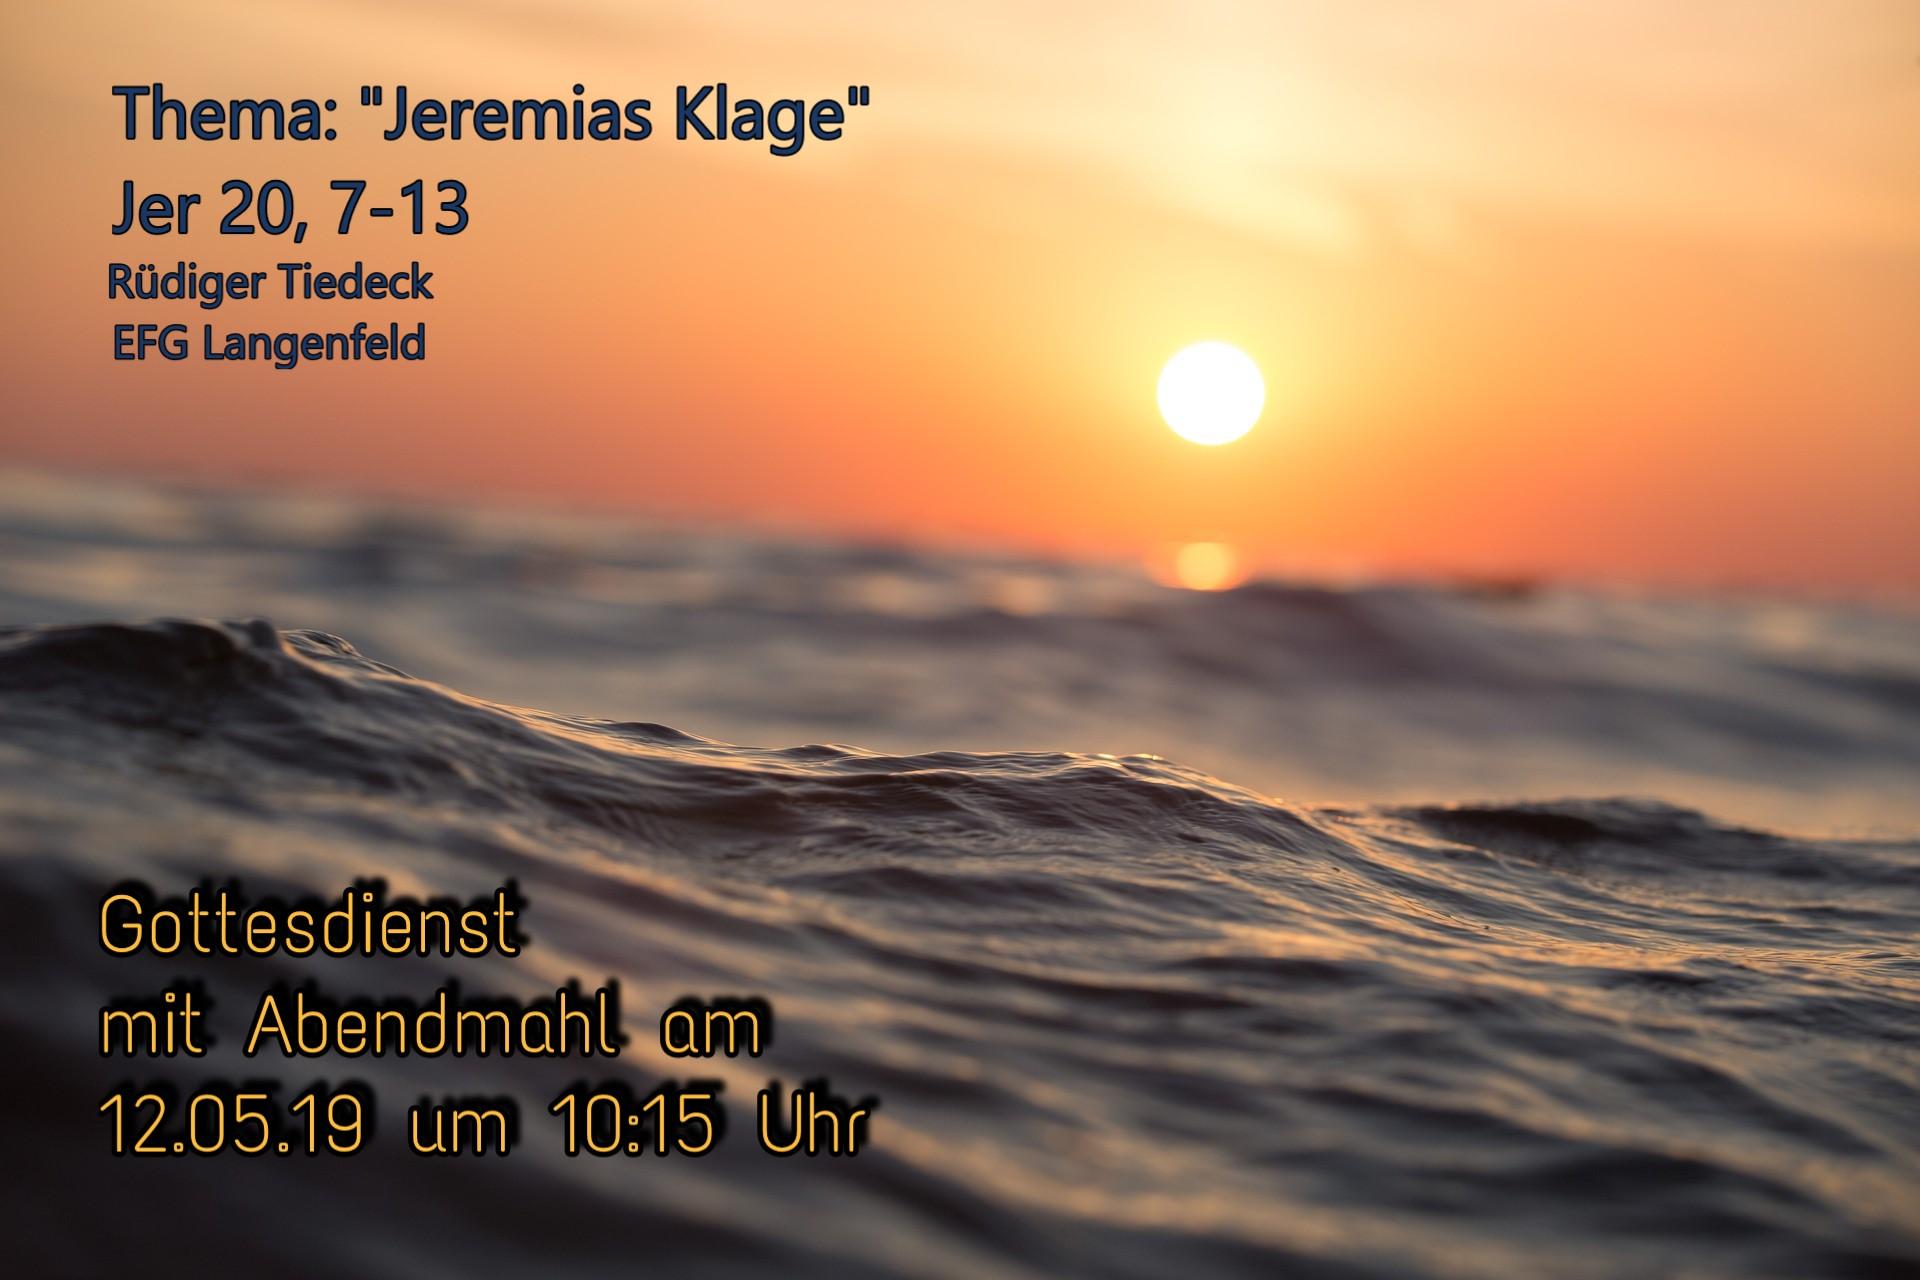 Jeremias Klage